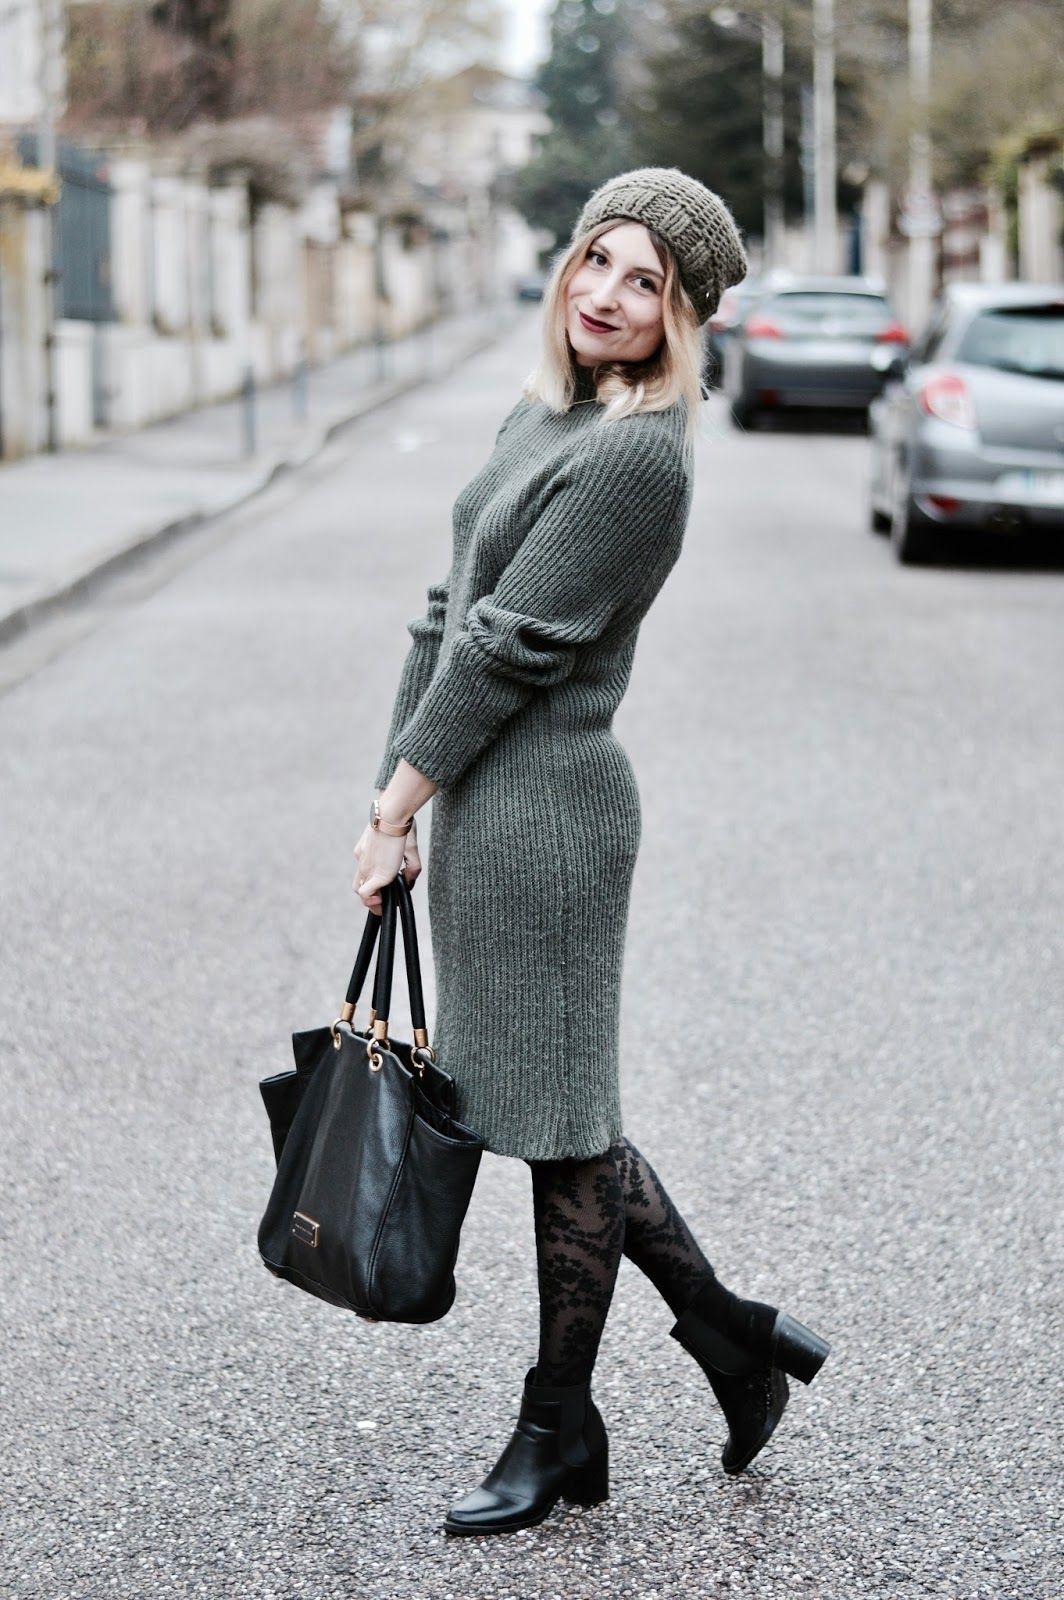 91dde9aeb44a8 look femme hiver 2018   robe pull kaki   TENUES ET LOOKS   Parka et ...